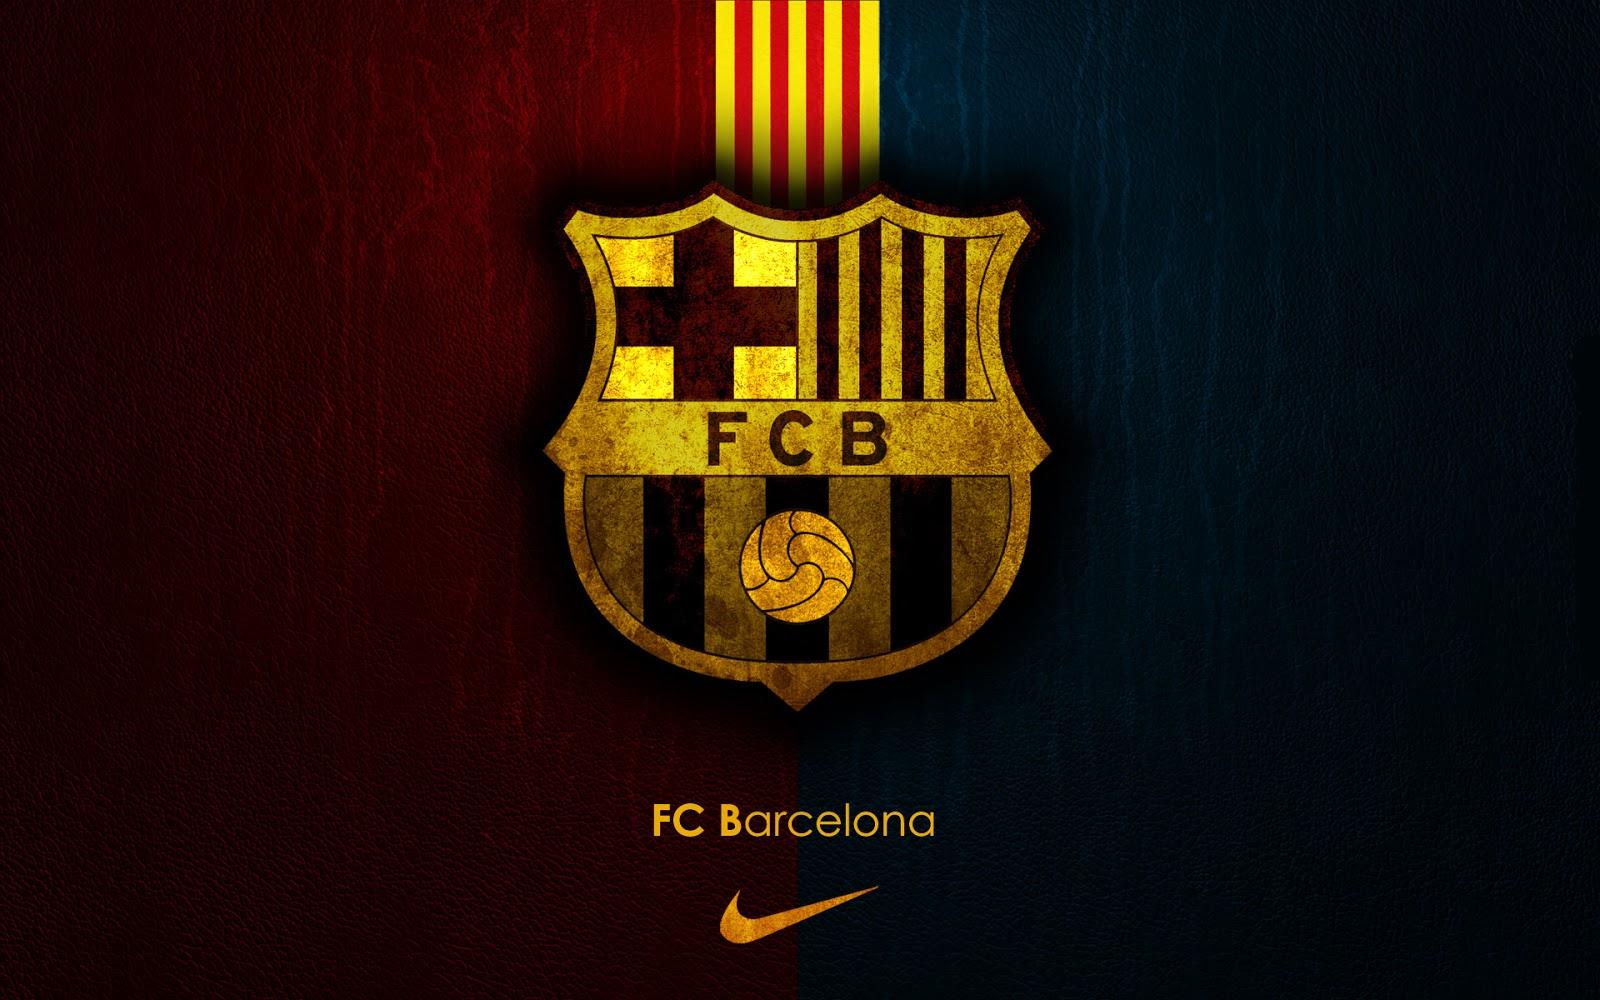 http://4.bp.blogspot.com/-r_N7hEtSvVI/UUS7InmFFDI/AAAAAAAAAqk/c3TnNgFhR98/s1600/Barcelona_Wallpaper1.jpg